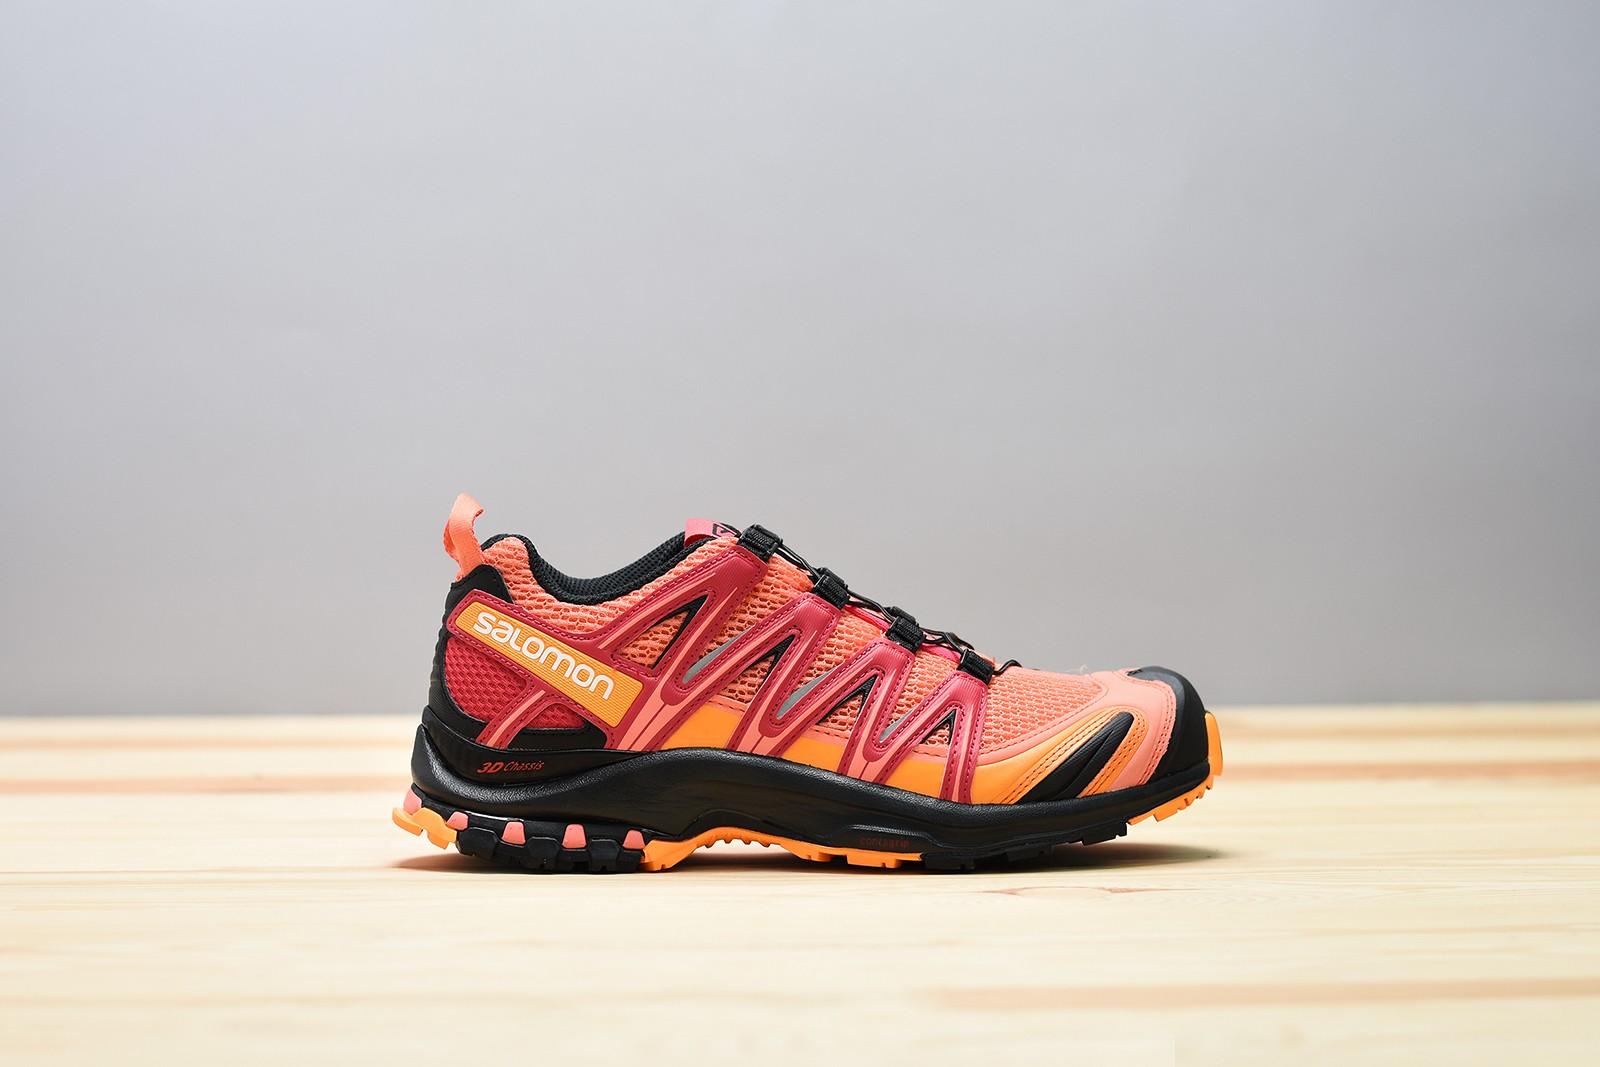 398520 Dámské Běžecké boty Salomon XA PRO 3D W Living Coral